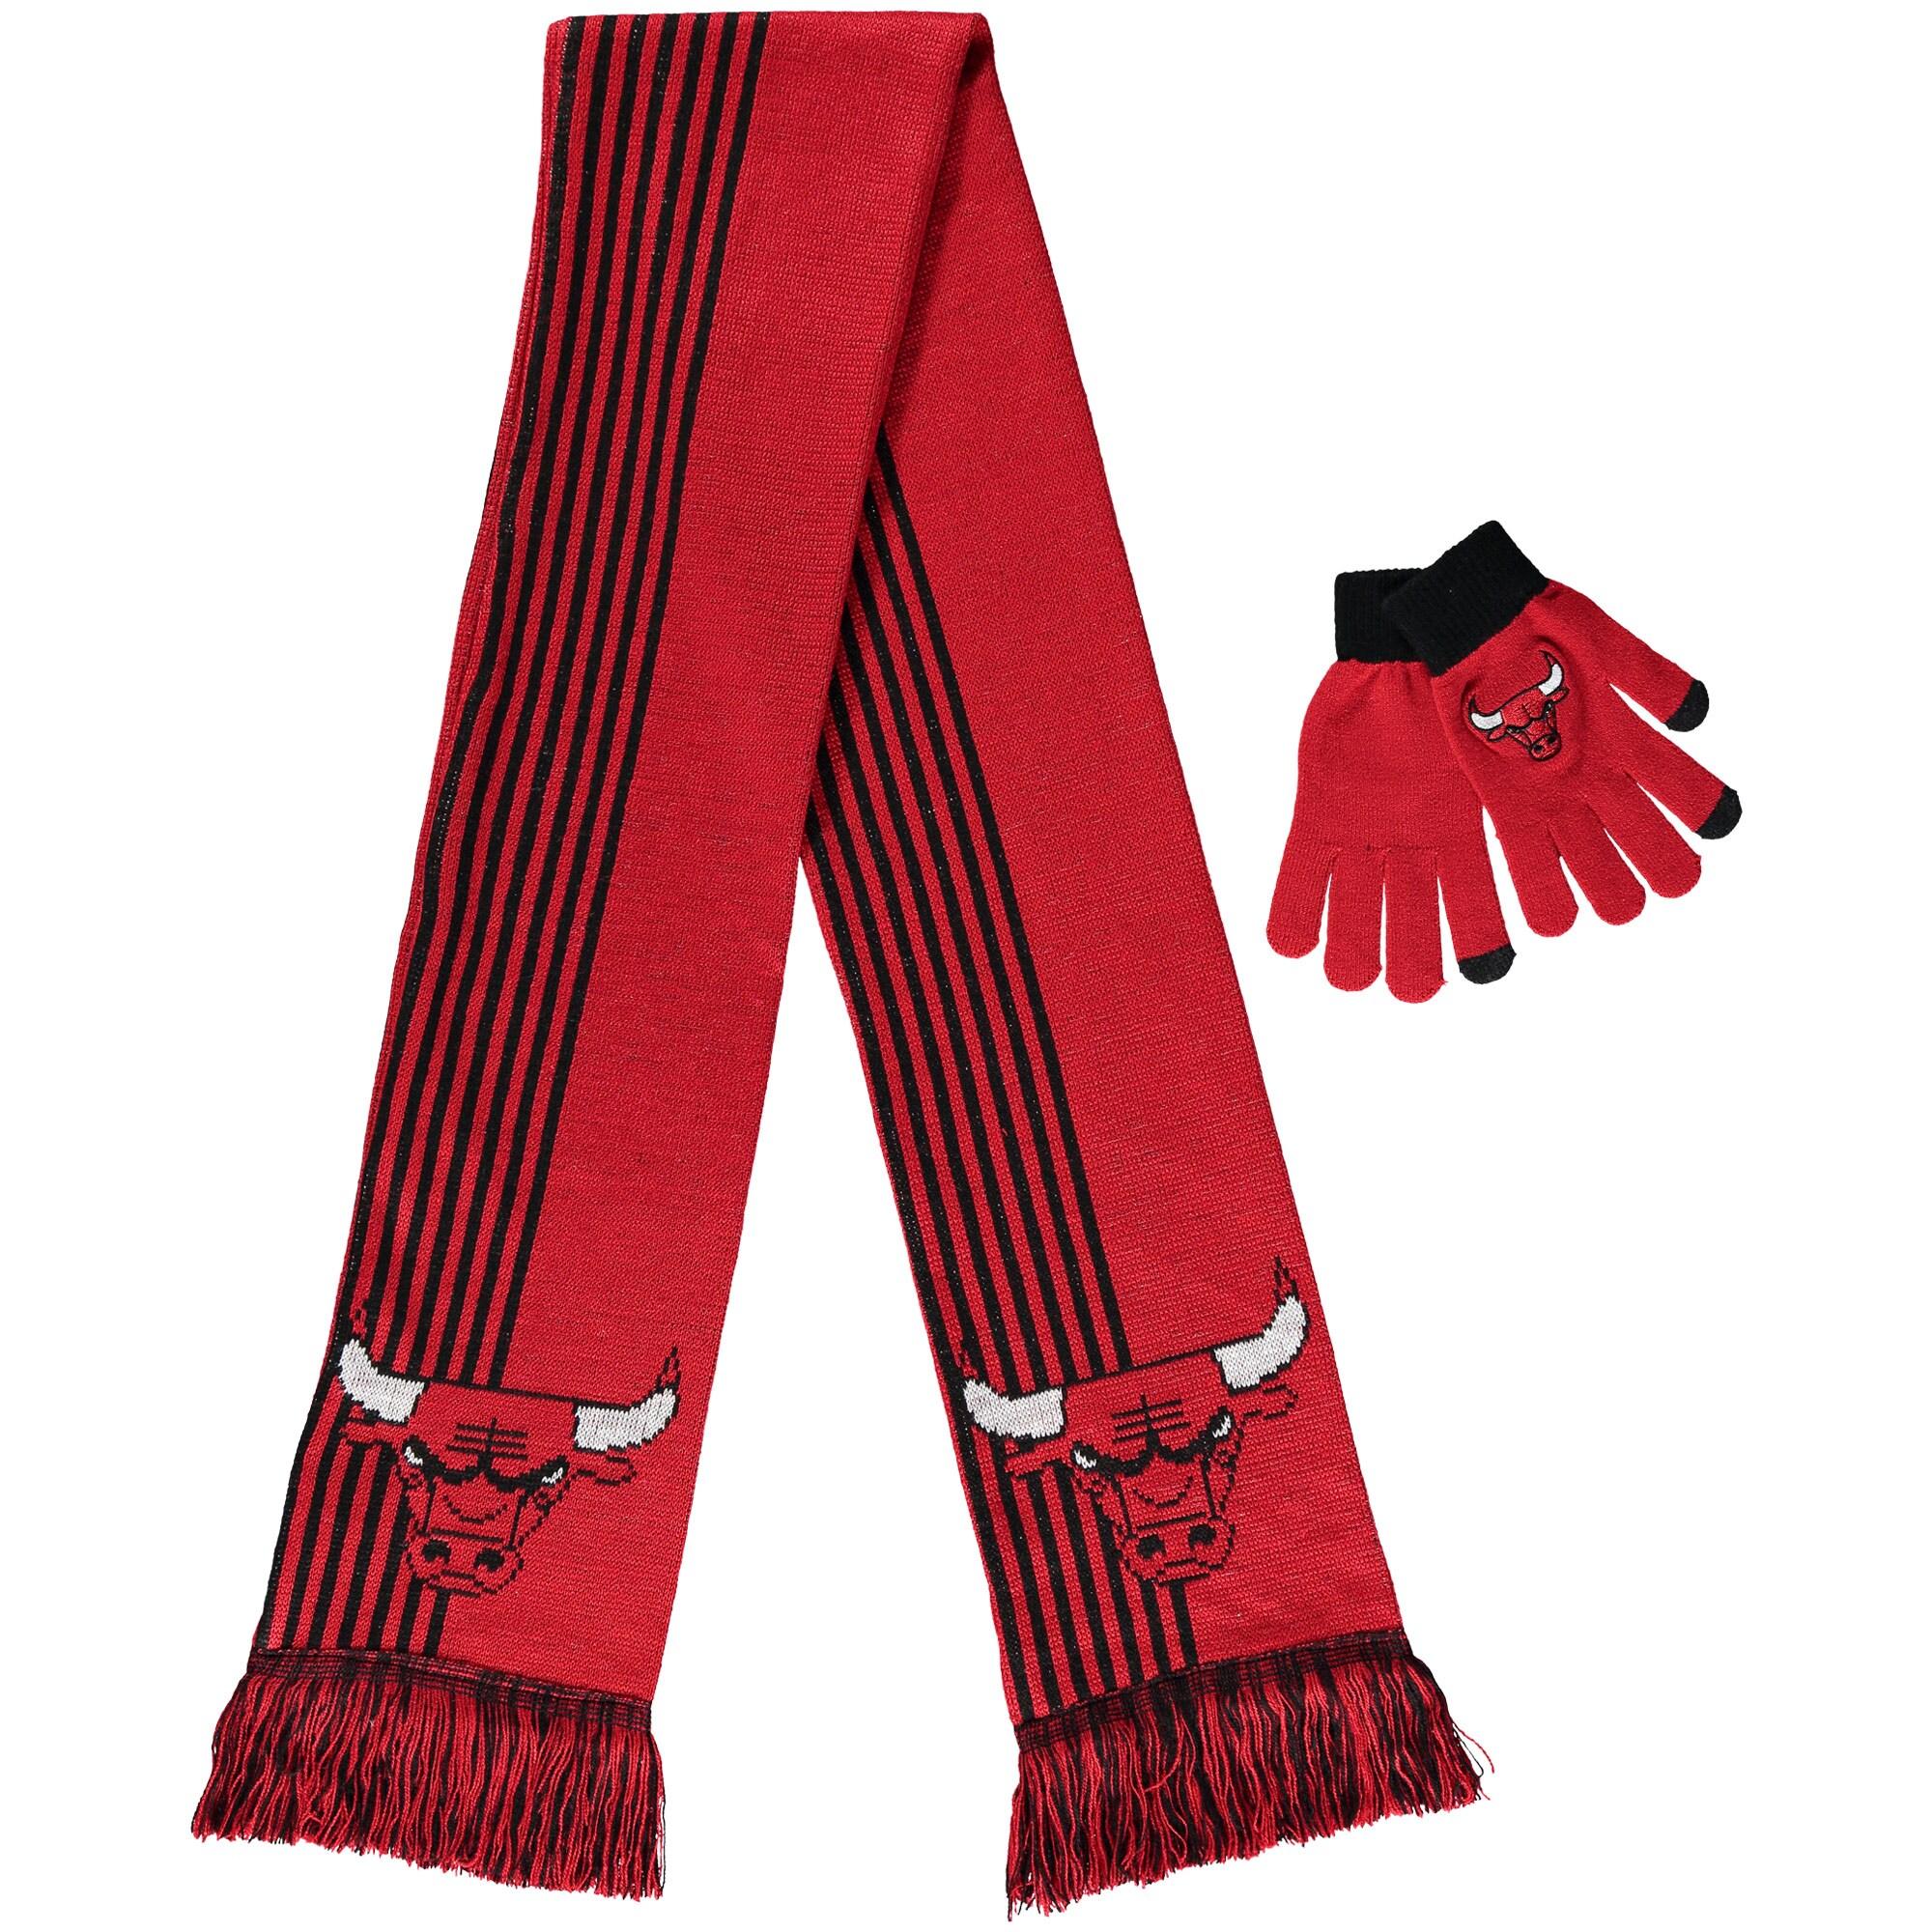 Chicago Bulls Women's Gloves & Scarf Set - Red